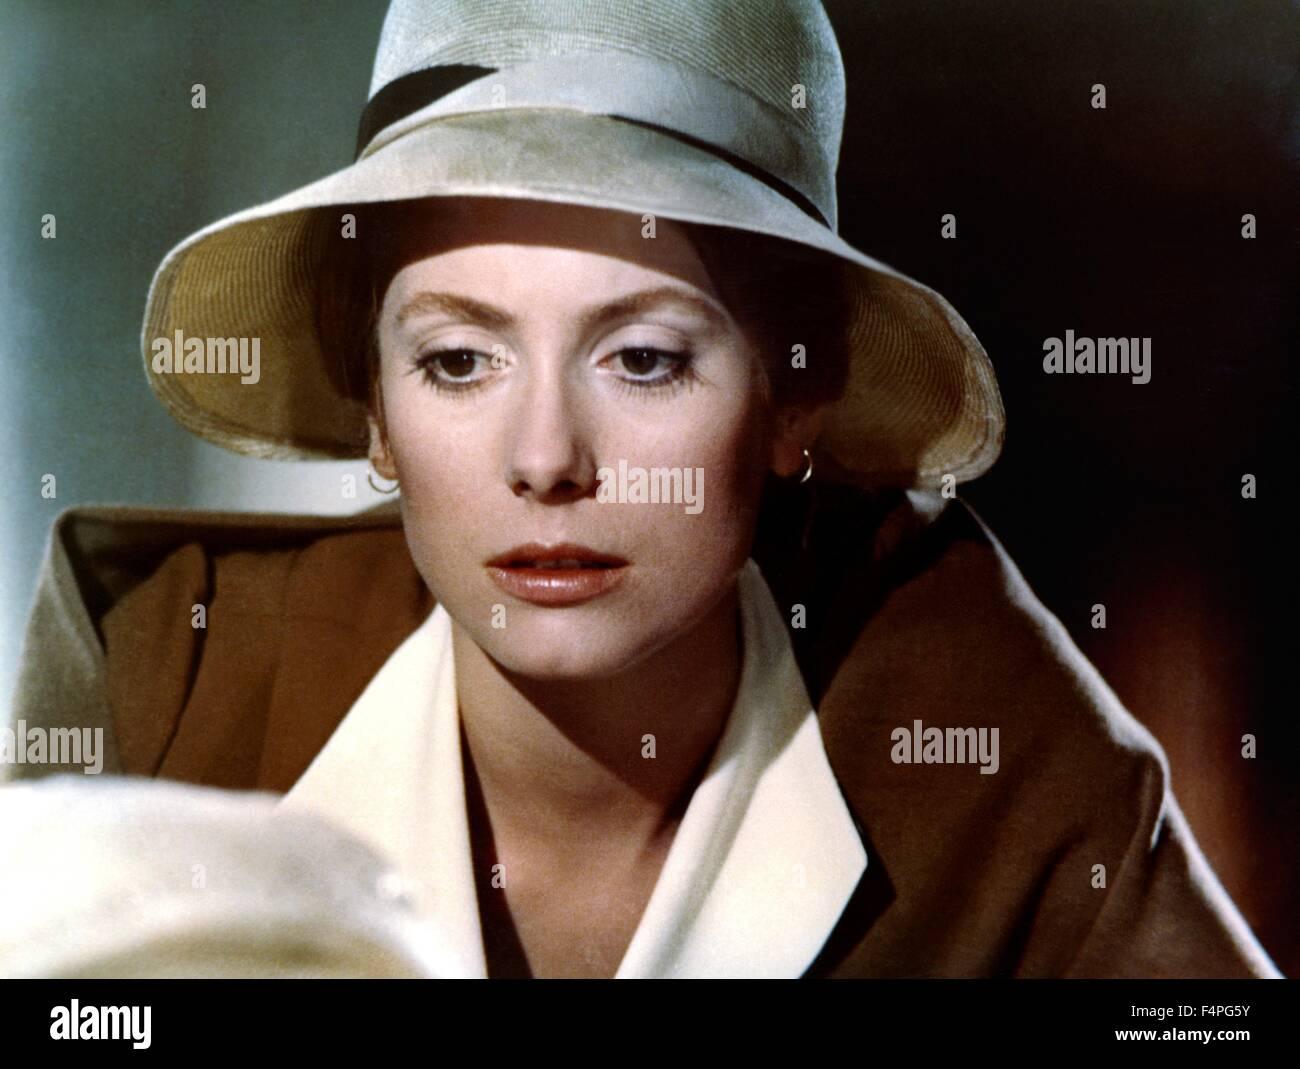 Catherine Deneuve / Tristana / 1970 directed by Luis Bunuel - Stock Image